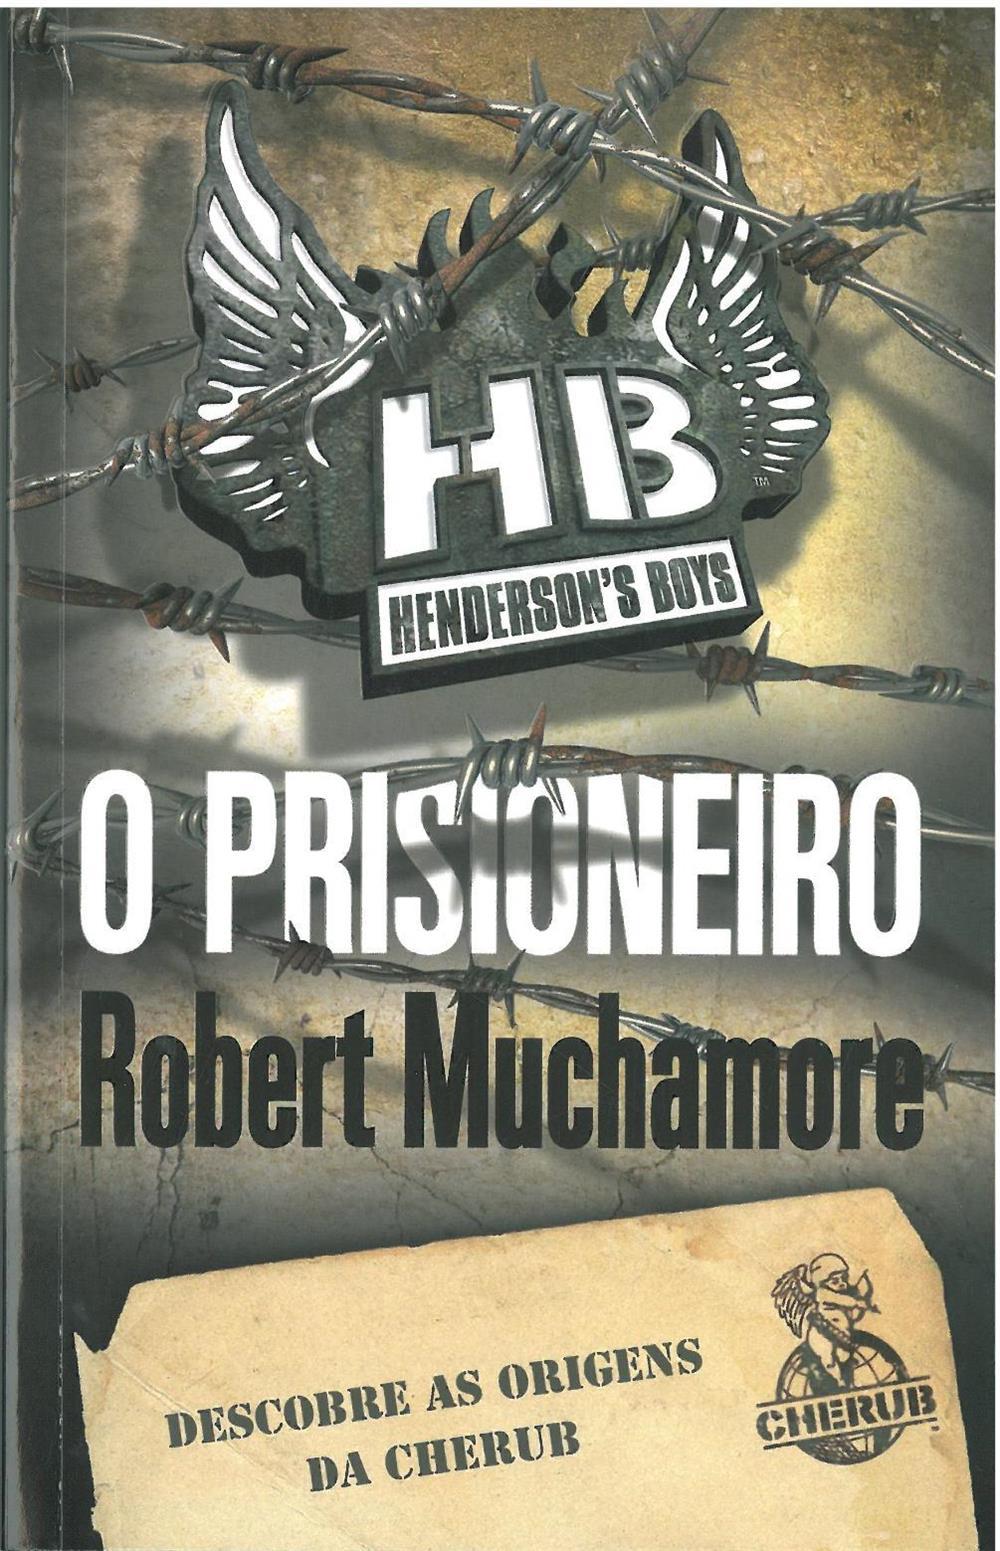 O prisioneiro_.jpg